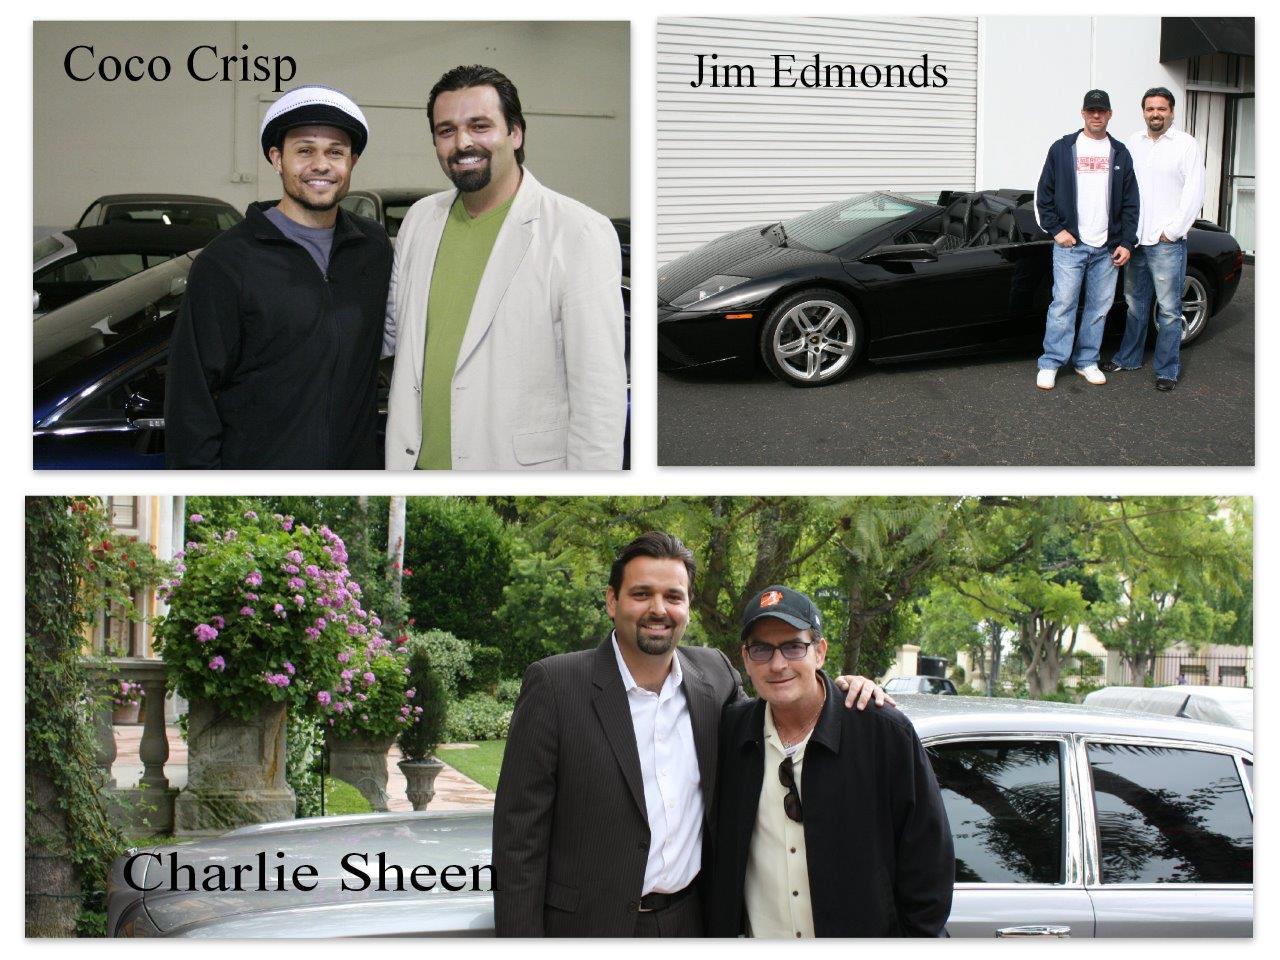 Photos w/ Coco Crisp | Jim Edmonds | Charlie Sheen